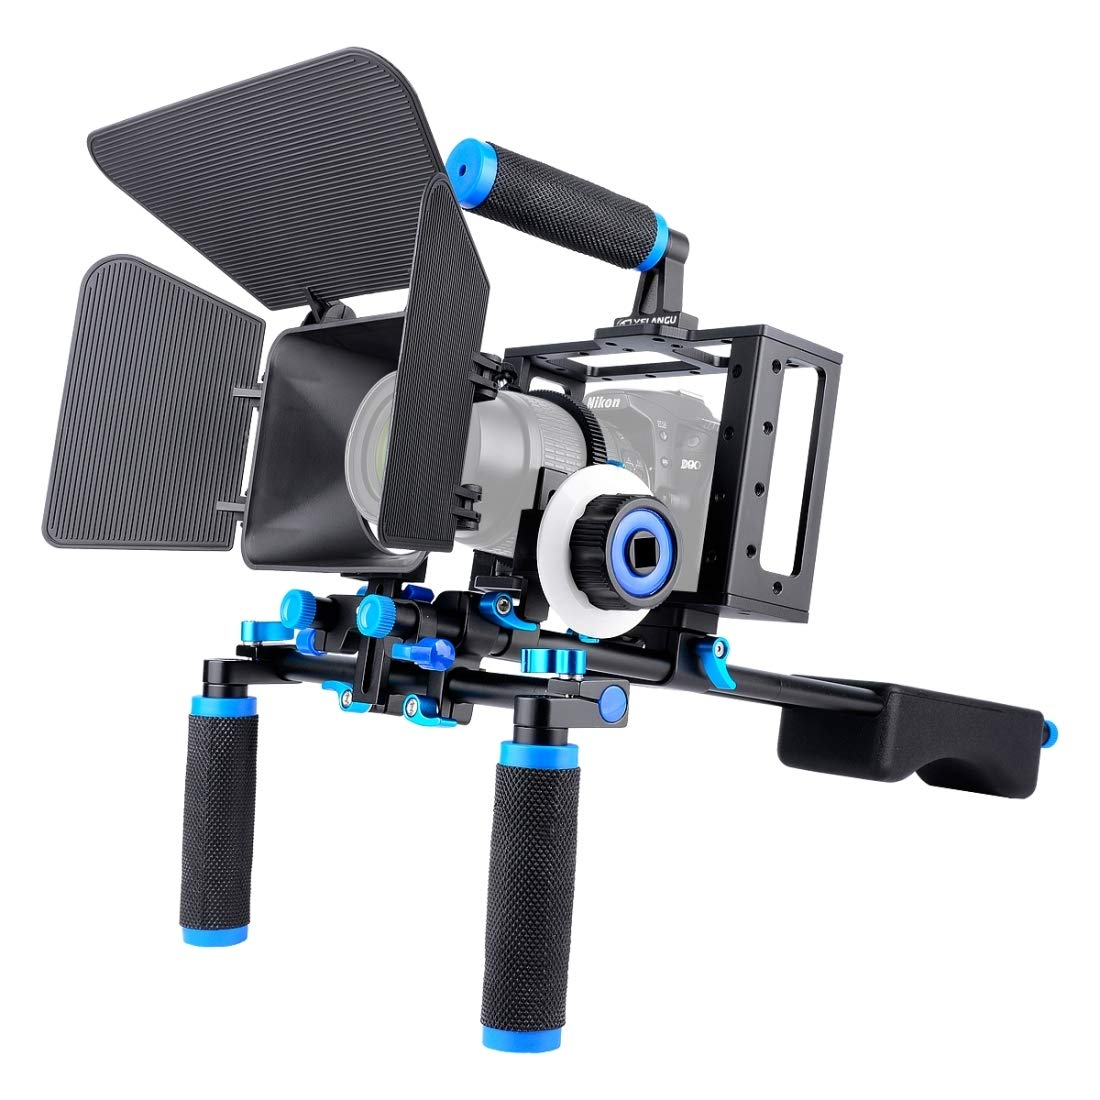 D222 デュアルハンドル カメラショルダーマウント カメラケージスタビライザーキット マットボックス付き デジタル一眼レフカメラ/ビデオカメラ用   B07LBQF1Z8